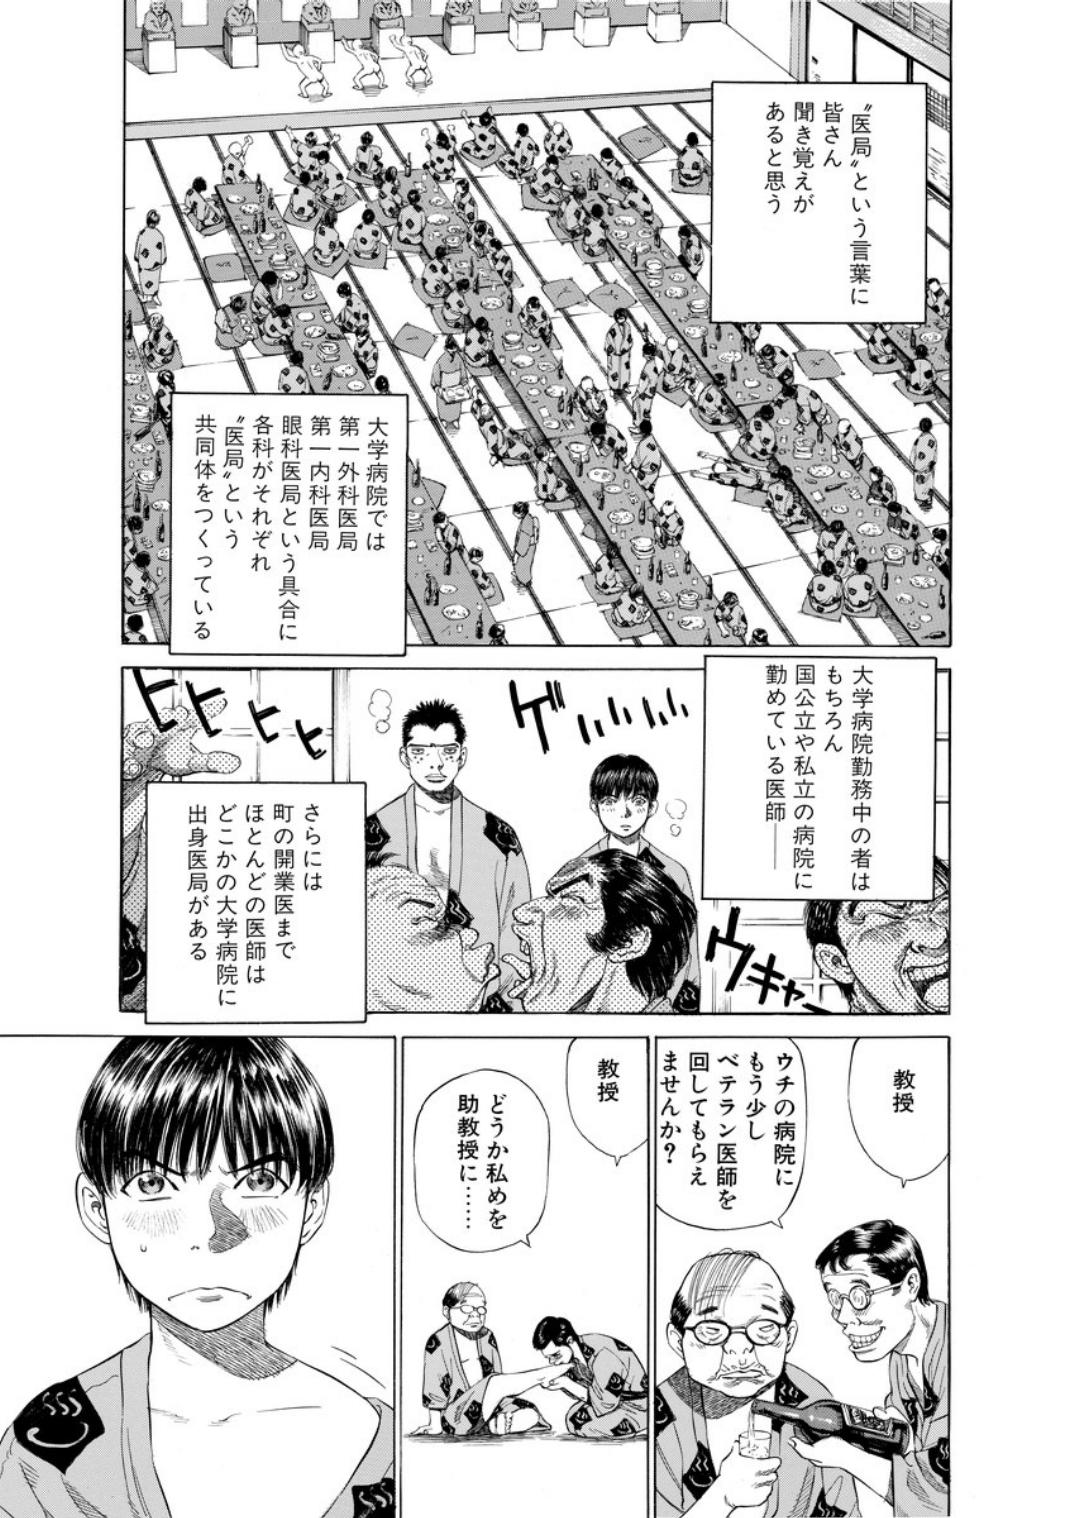 001bj_page-0151.jpg